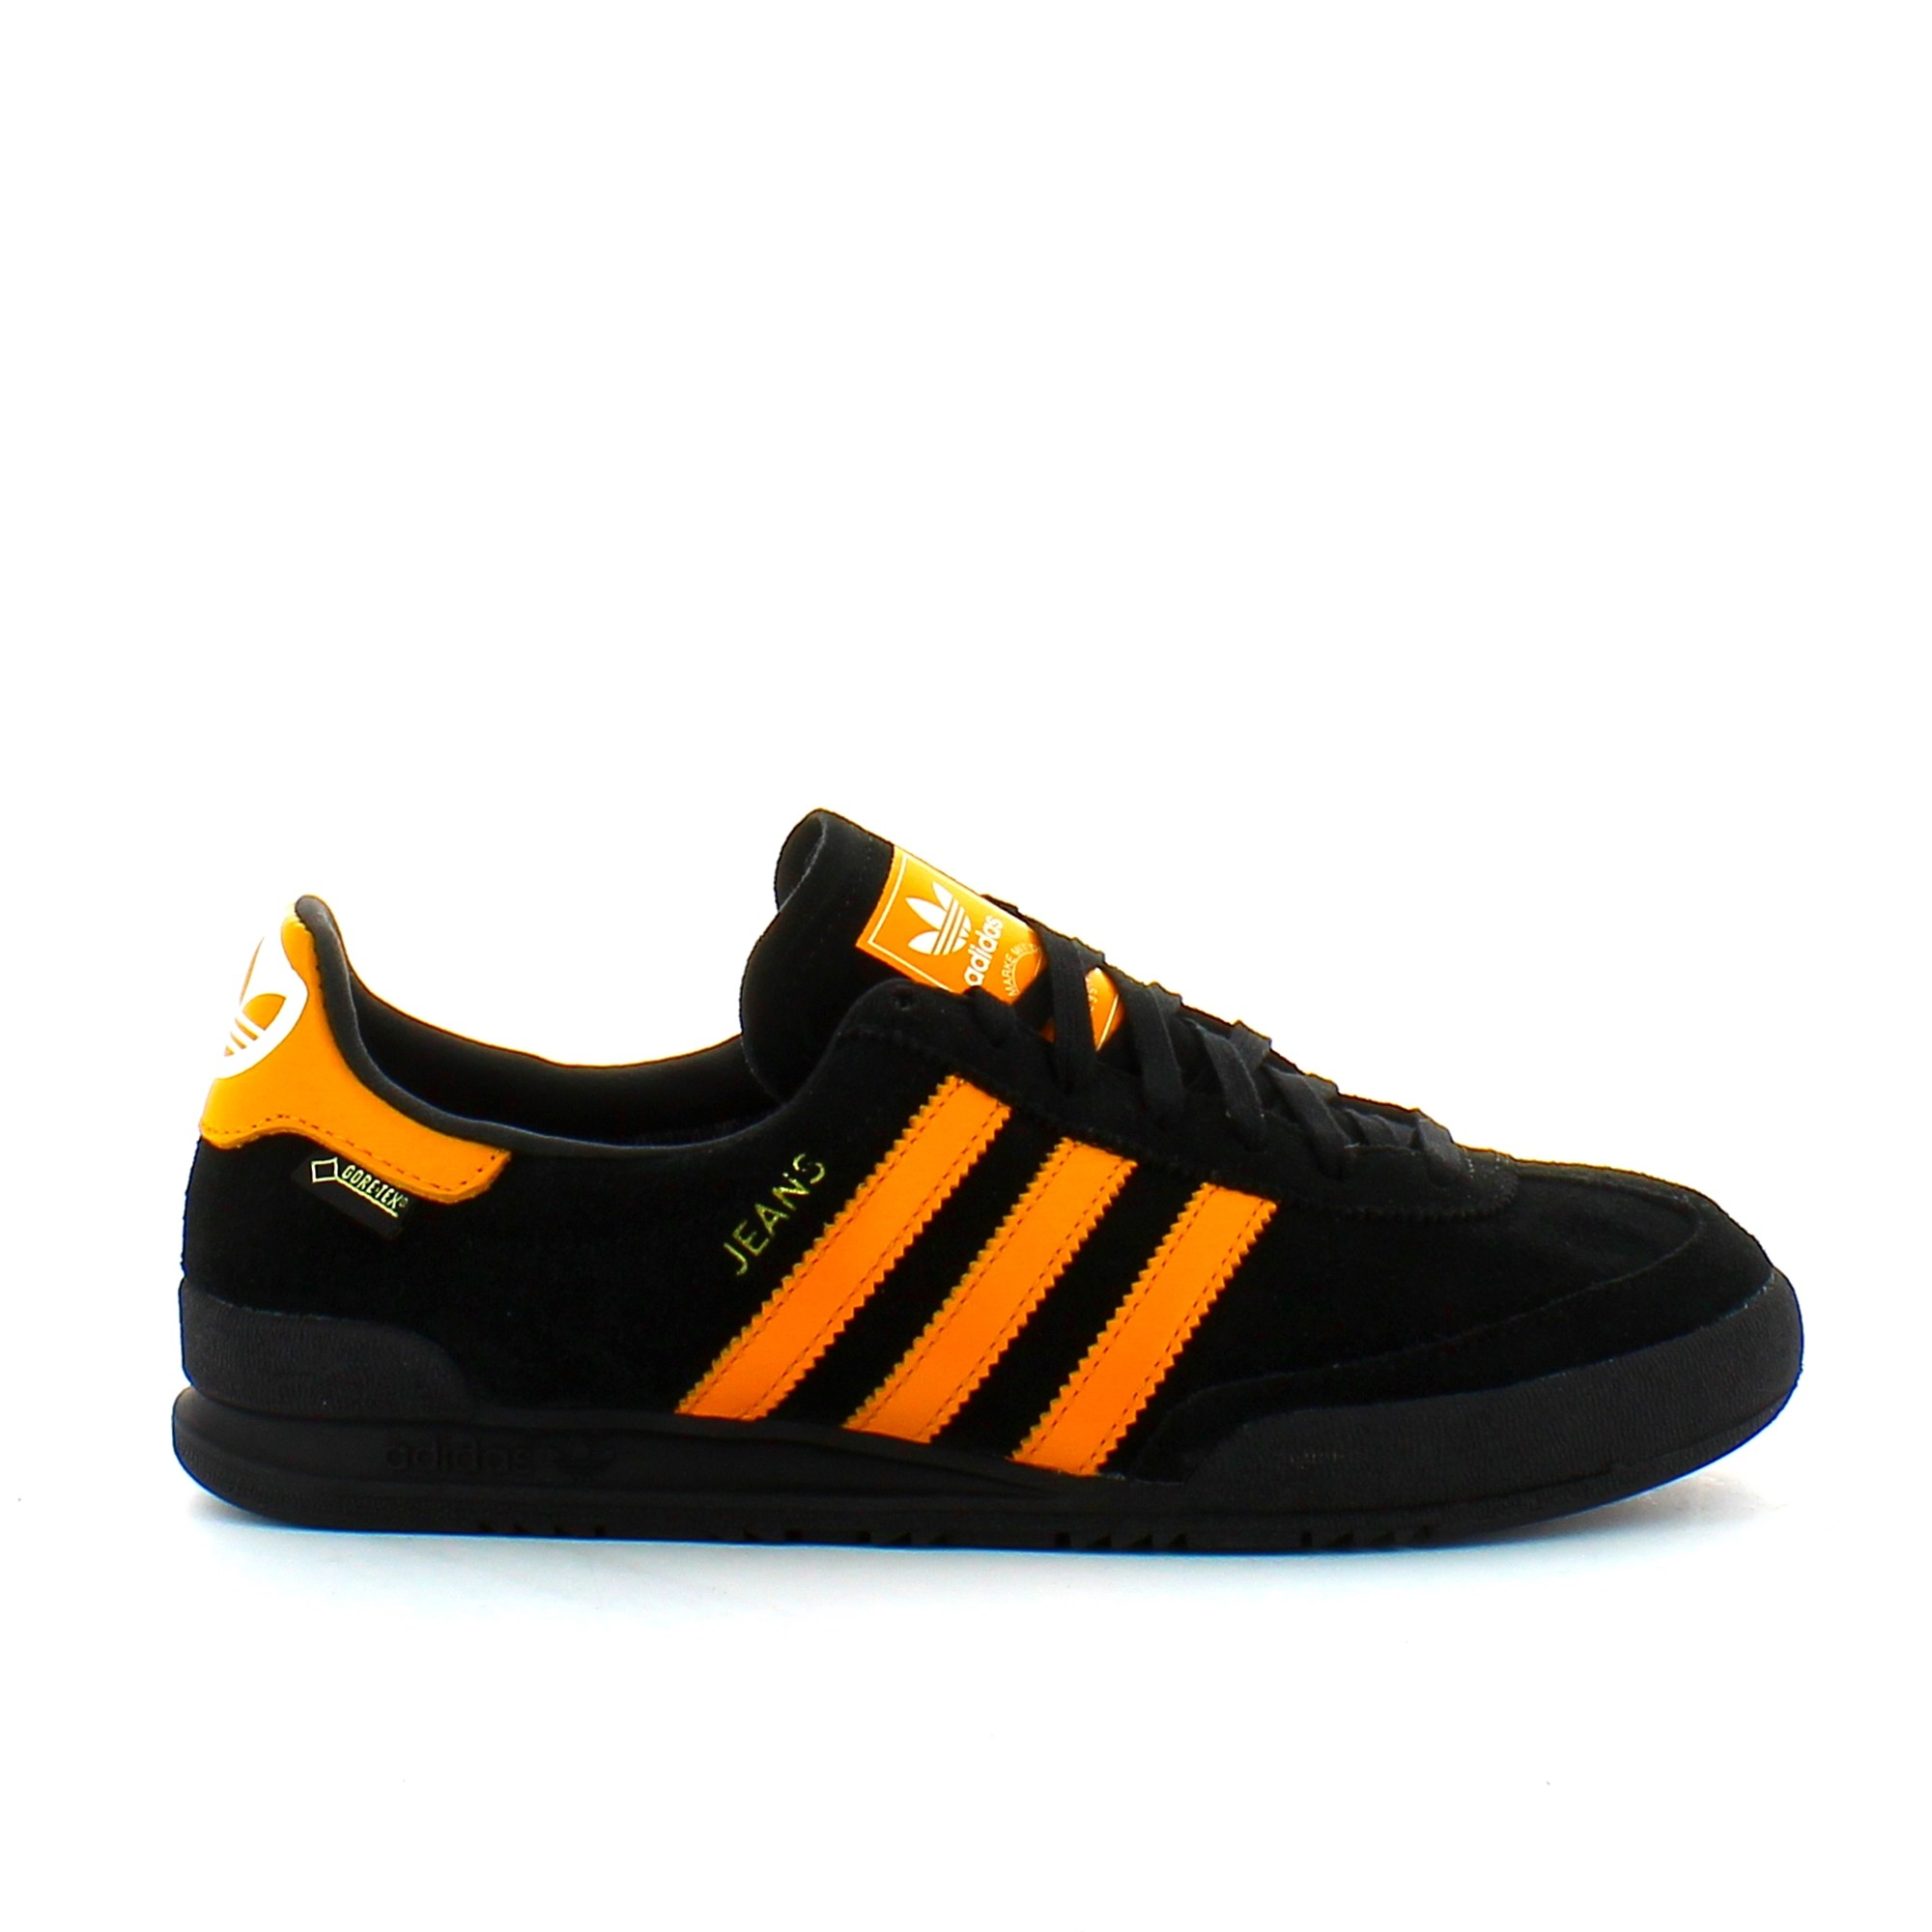 Deportes Jeans Negro Gtx Naranja Adidas Moya Hombre Zapatillas npFTqZAA